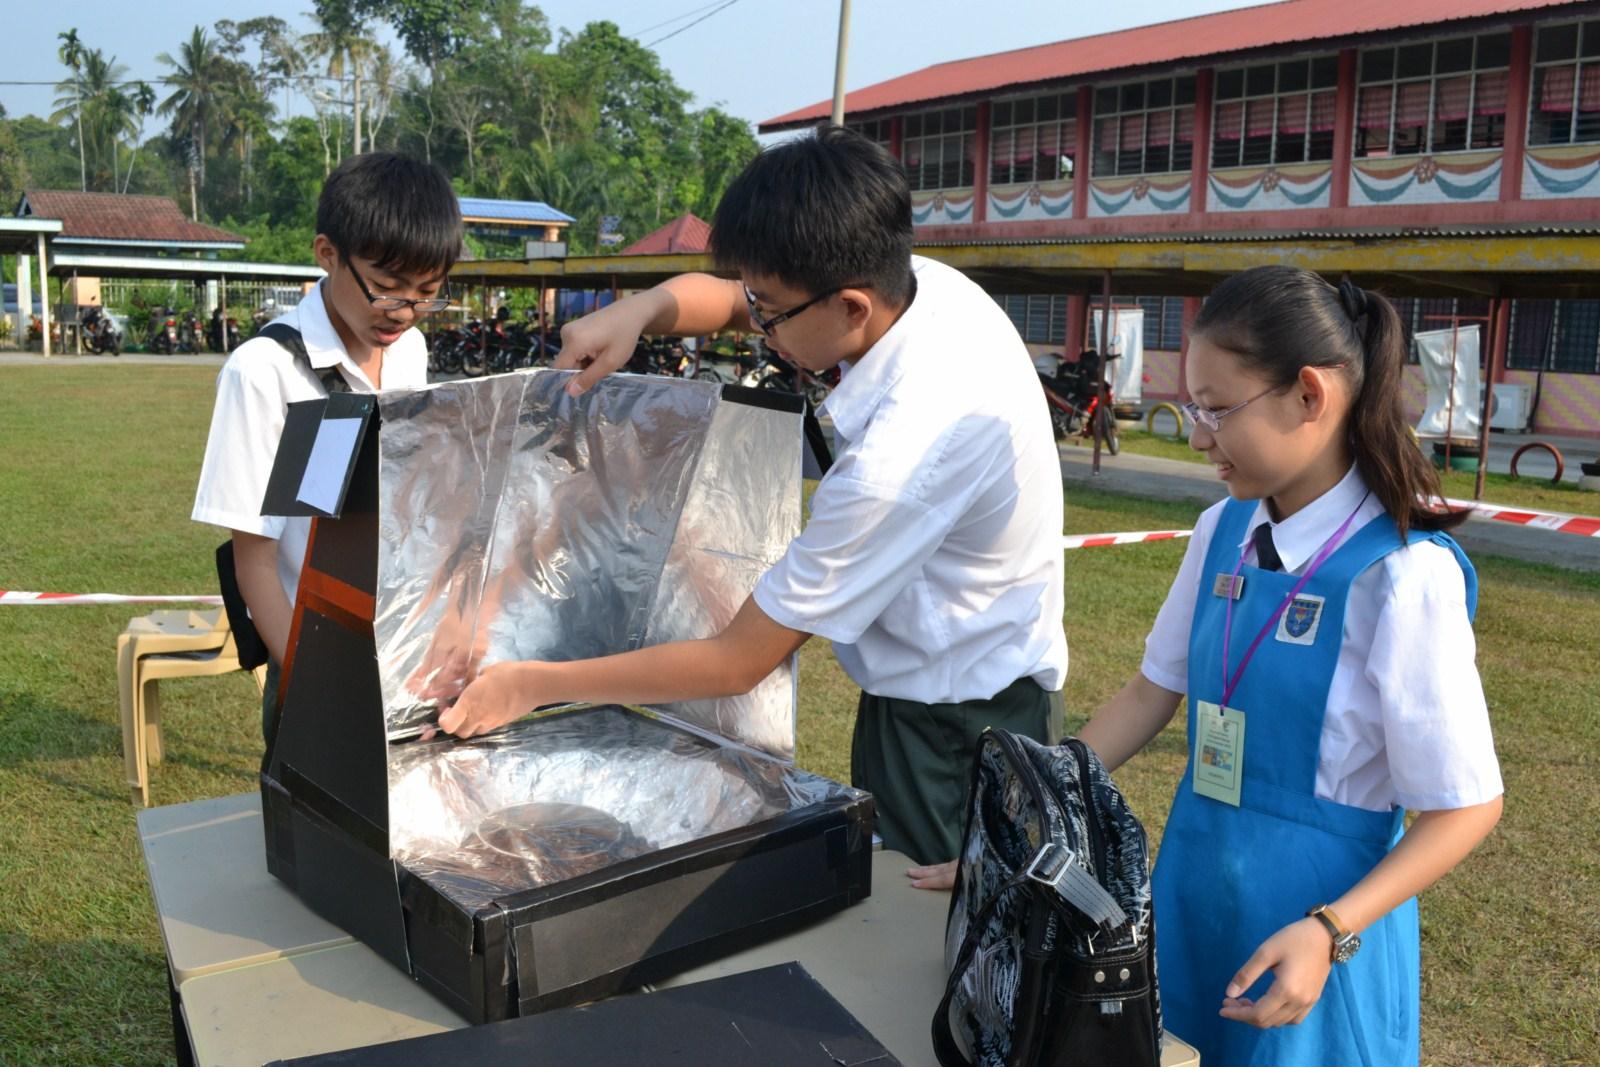 Dapur Solar Smk Dato Bendahara Cm Yusuf June 2017